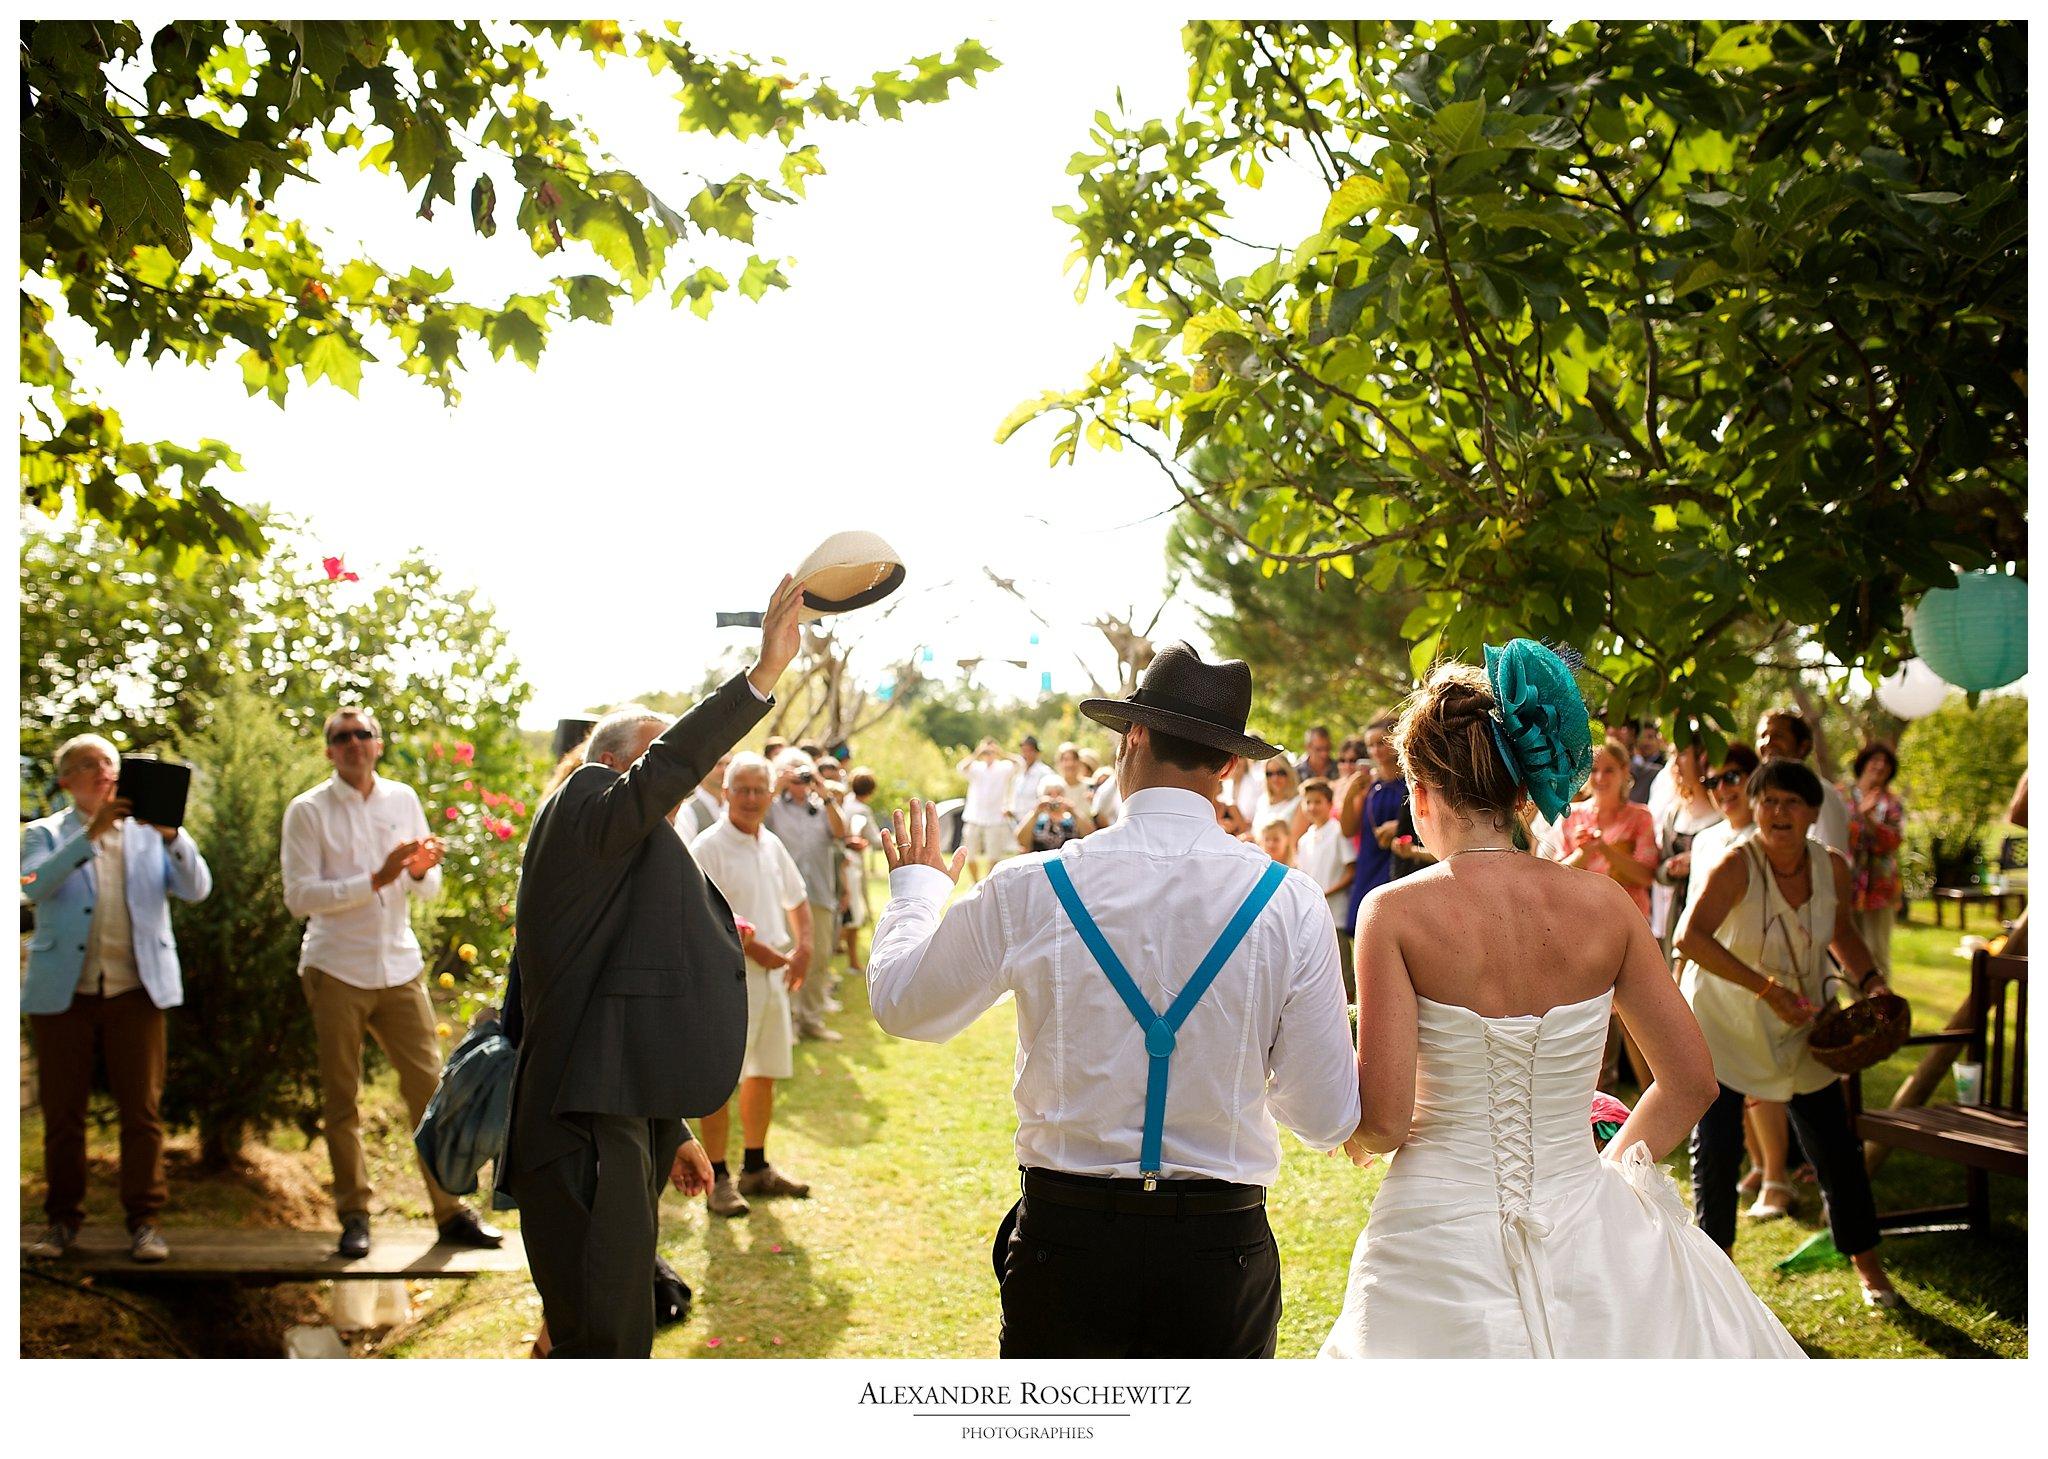 Photographe mariage à Pauillac et Patiras – Madeleine + Simon – Teaser